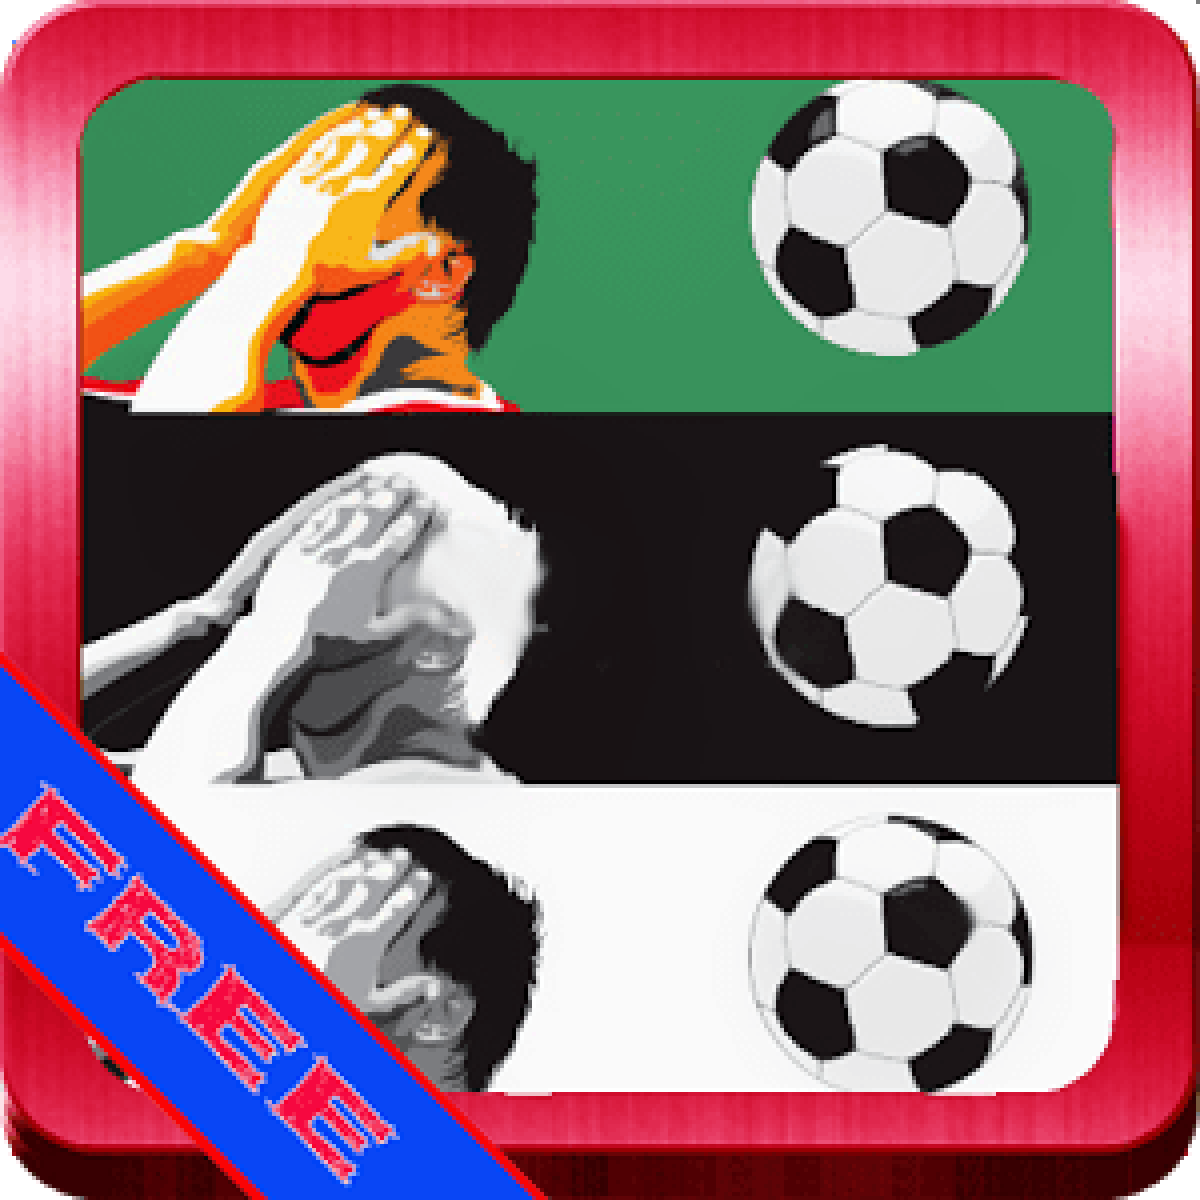 Campeonato de Fútbol Megakick